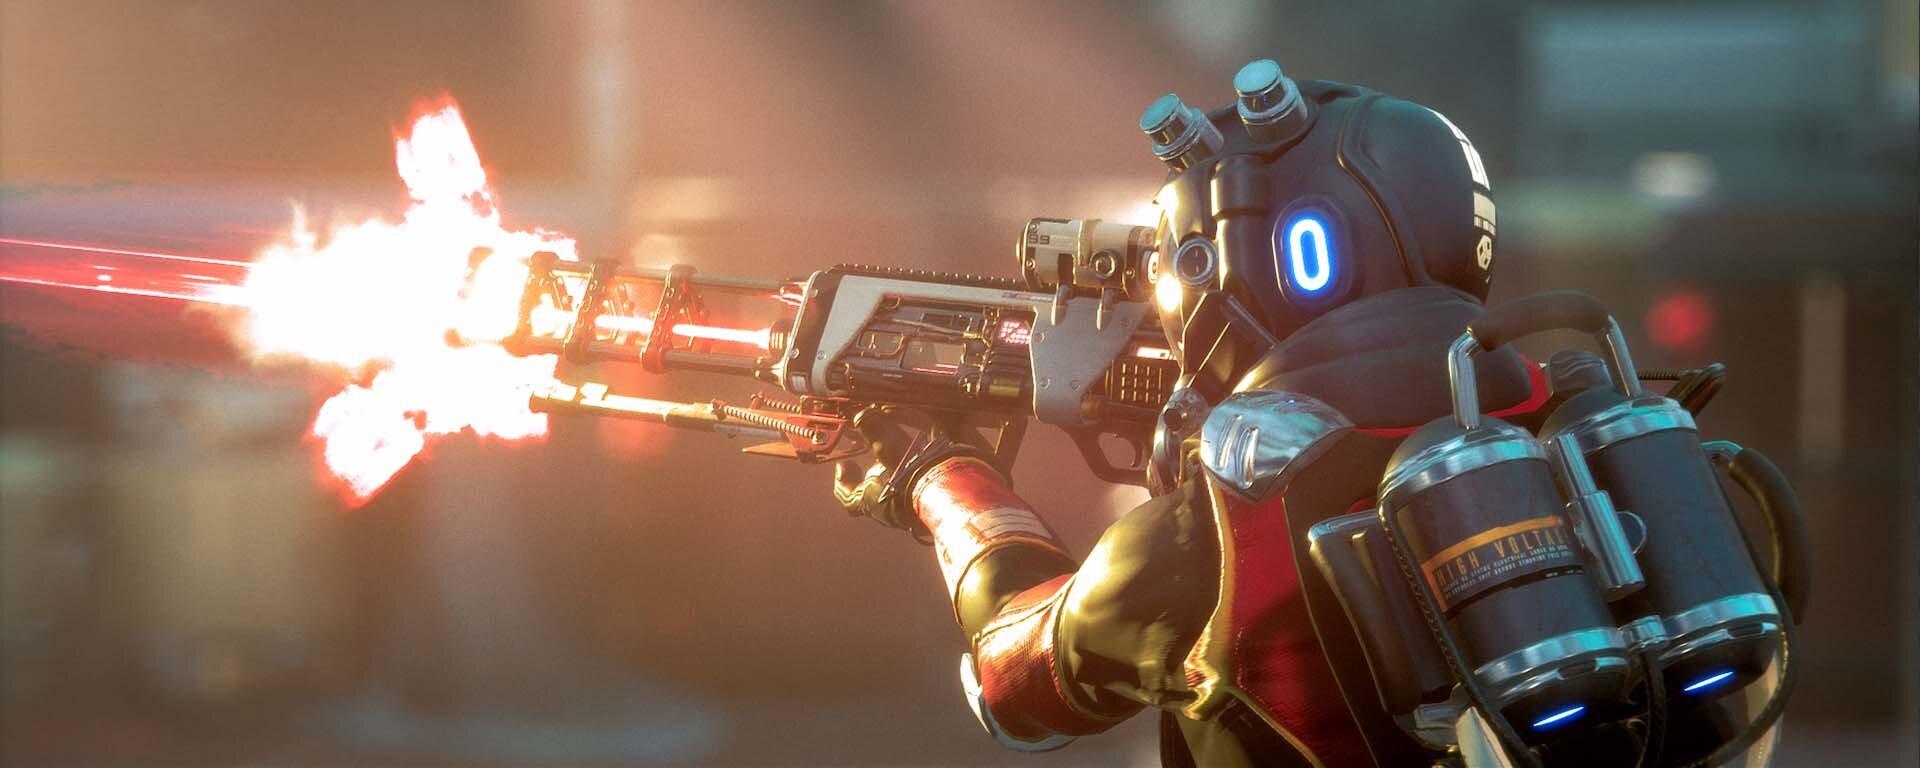 Turn Based FPS Lemnis Gate Character fires sniper rifle.